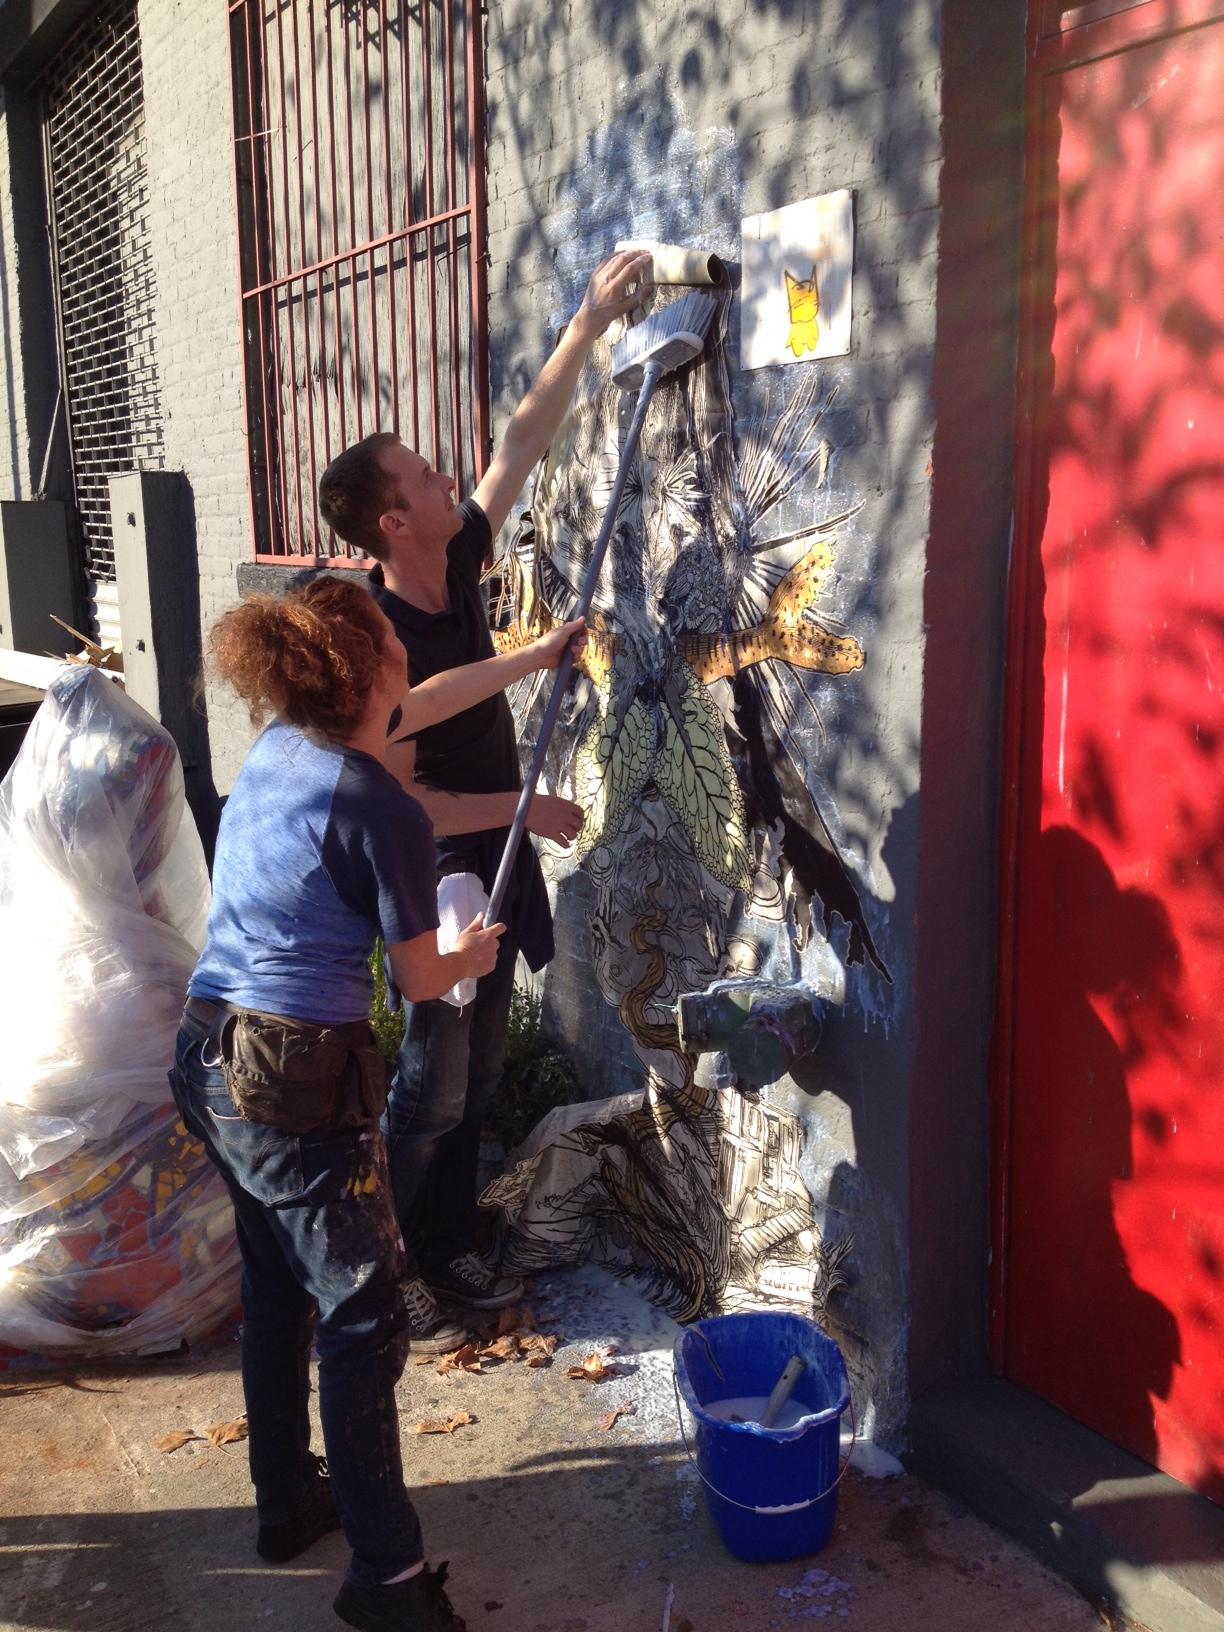 Artist, Swoon, installs a wheatpaste mural on Douglass Street in honor of Gowanus Open Studios 2013.